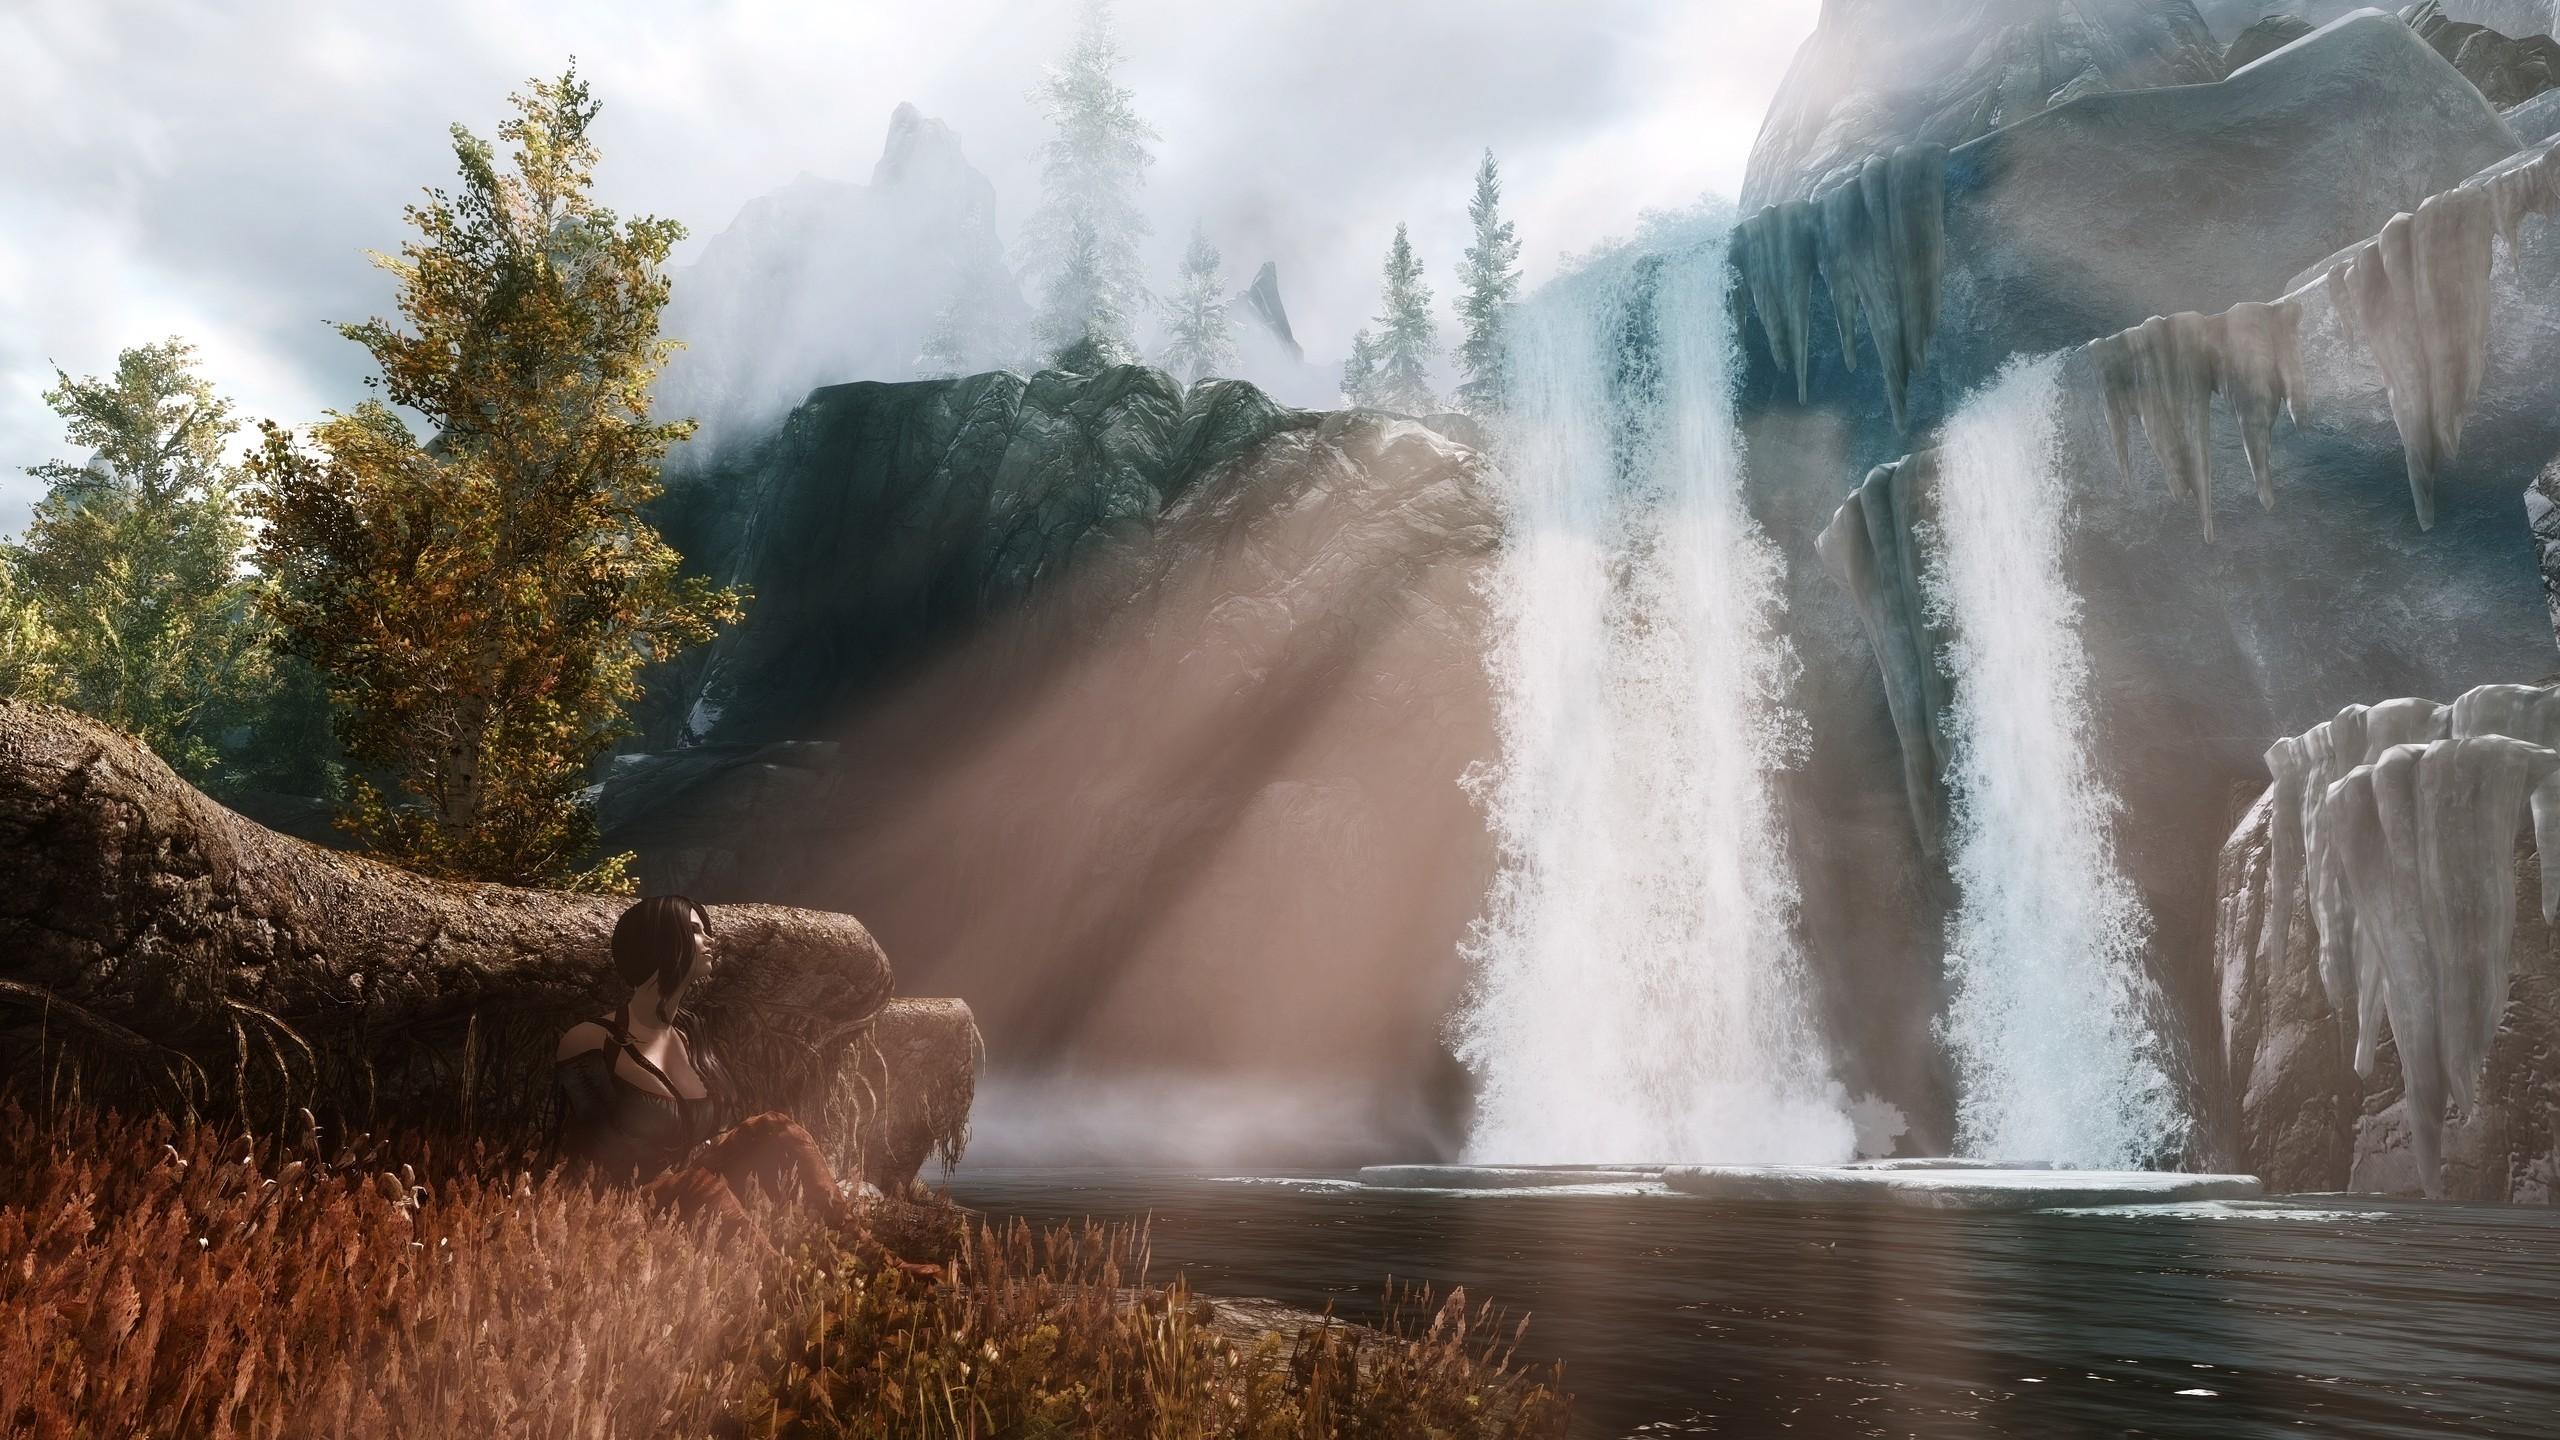 Skyrim Elder Scrolls Waterfall wallpaper     85906   WallpaperUP